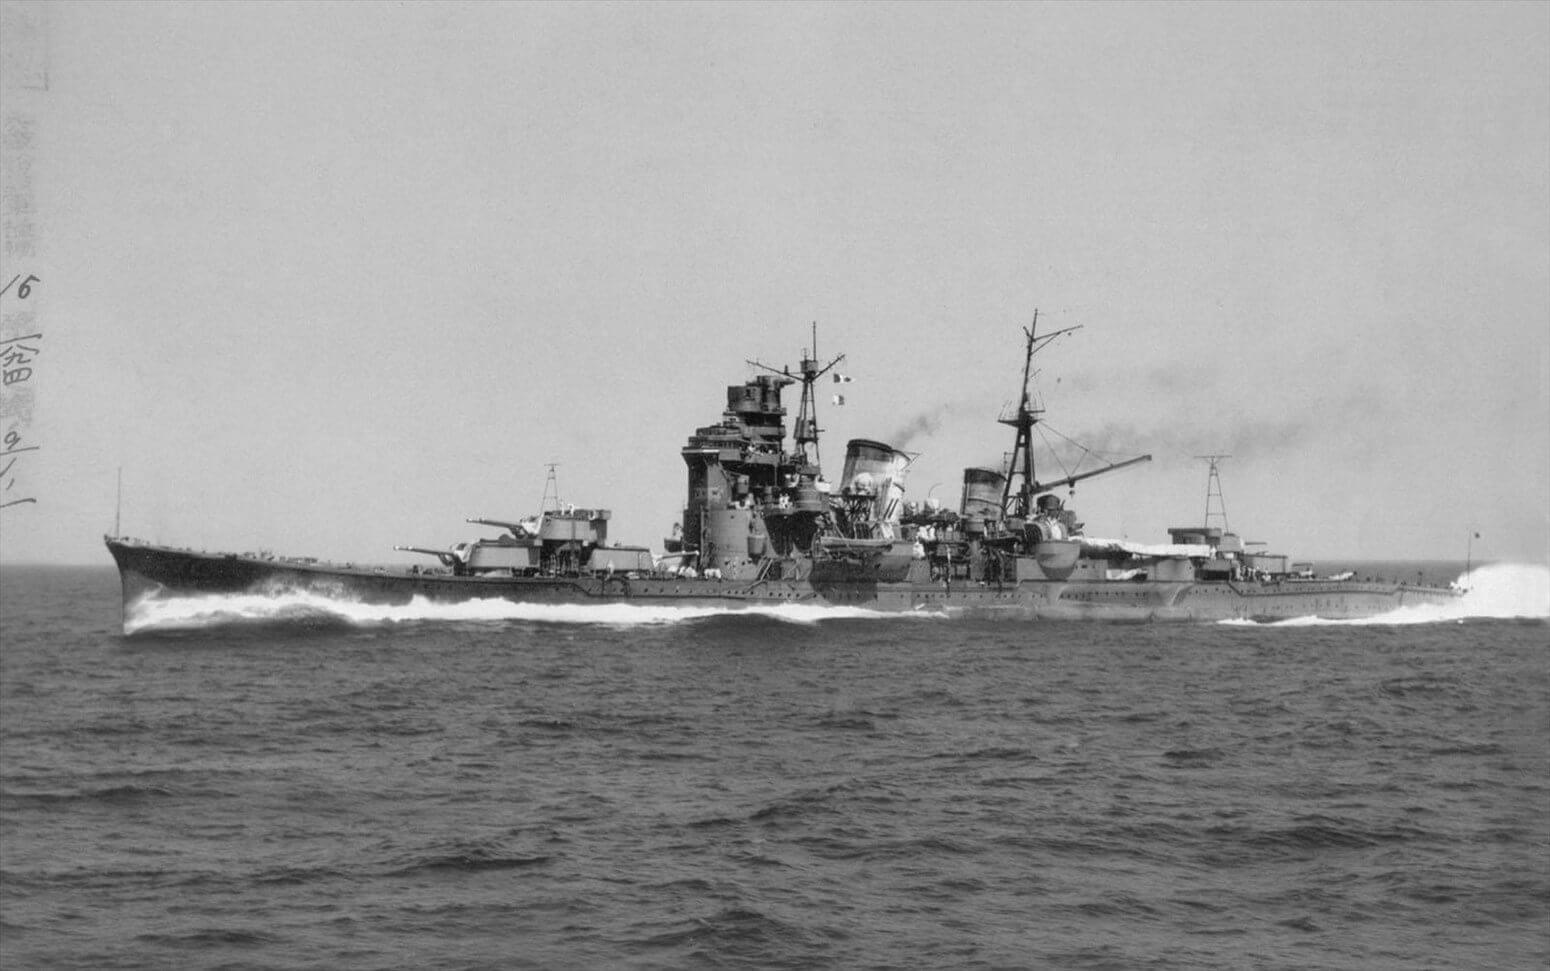 妙高【妙高型重巡洋艦 一番艦】<br><font size=5%>MYOKO【MYOKO-class Heavy Cruiser 1st】</font>